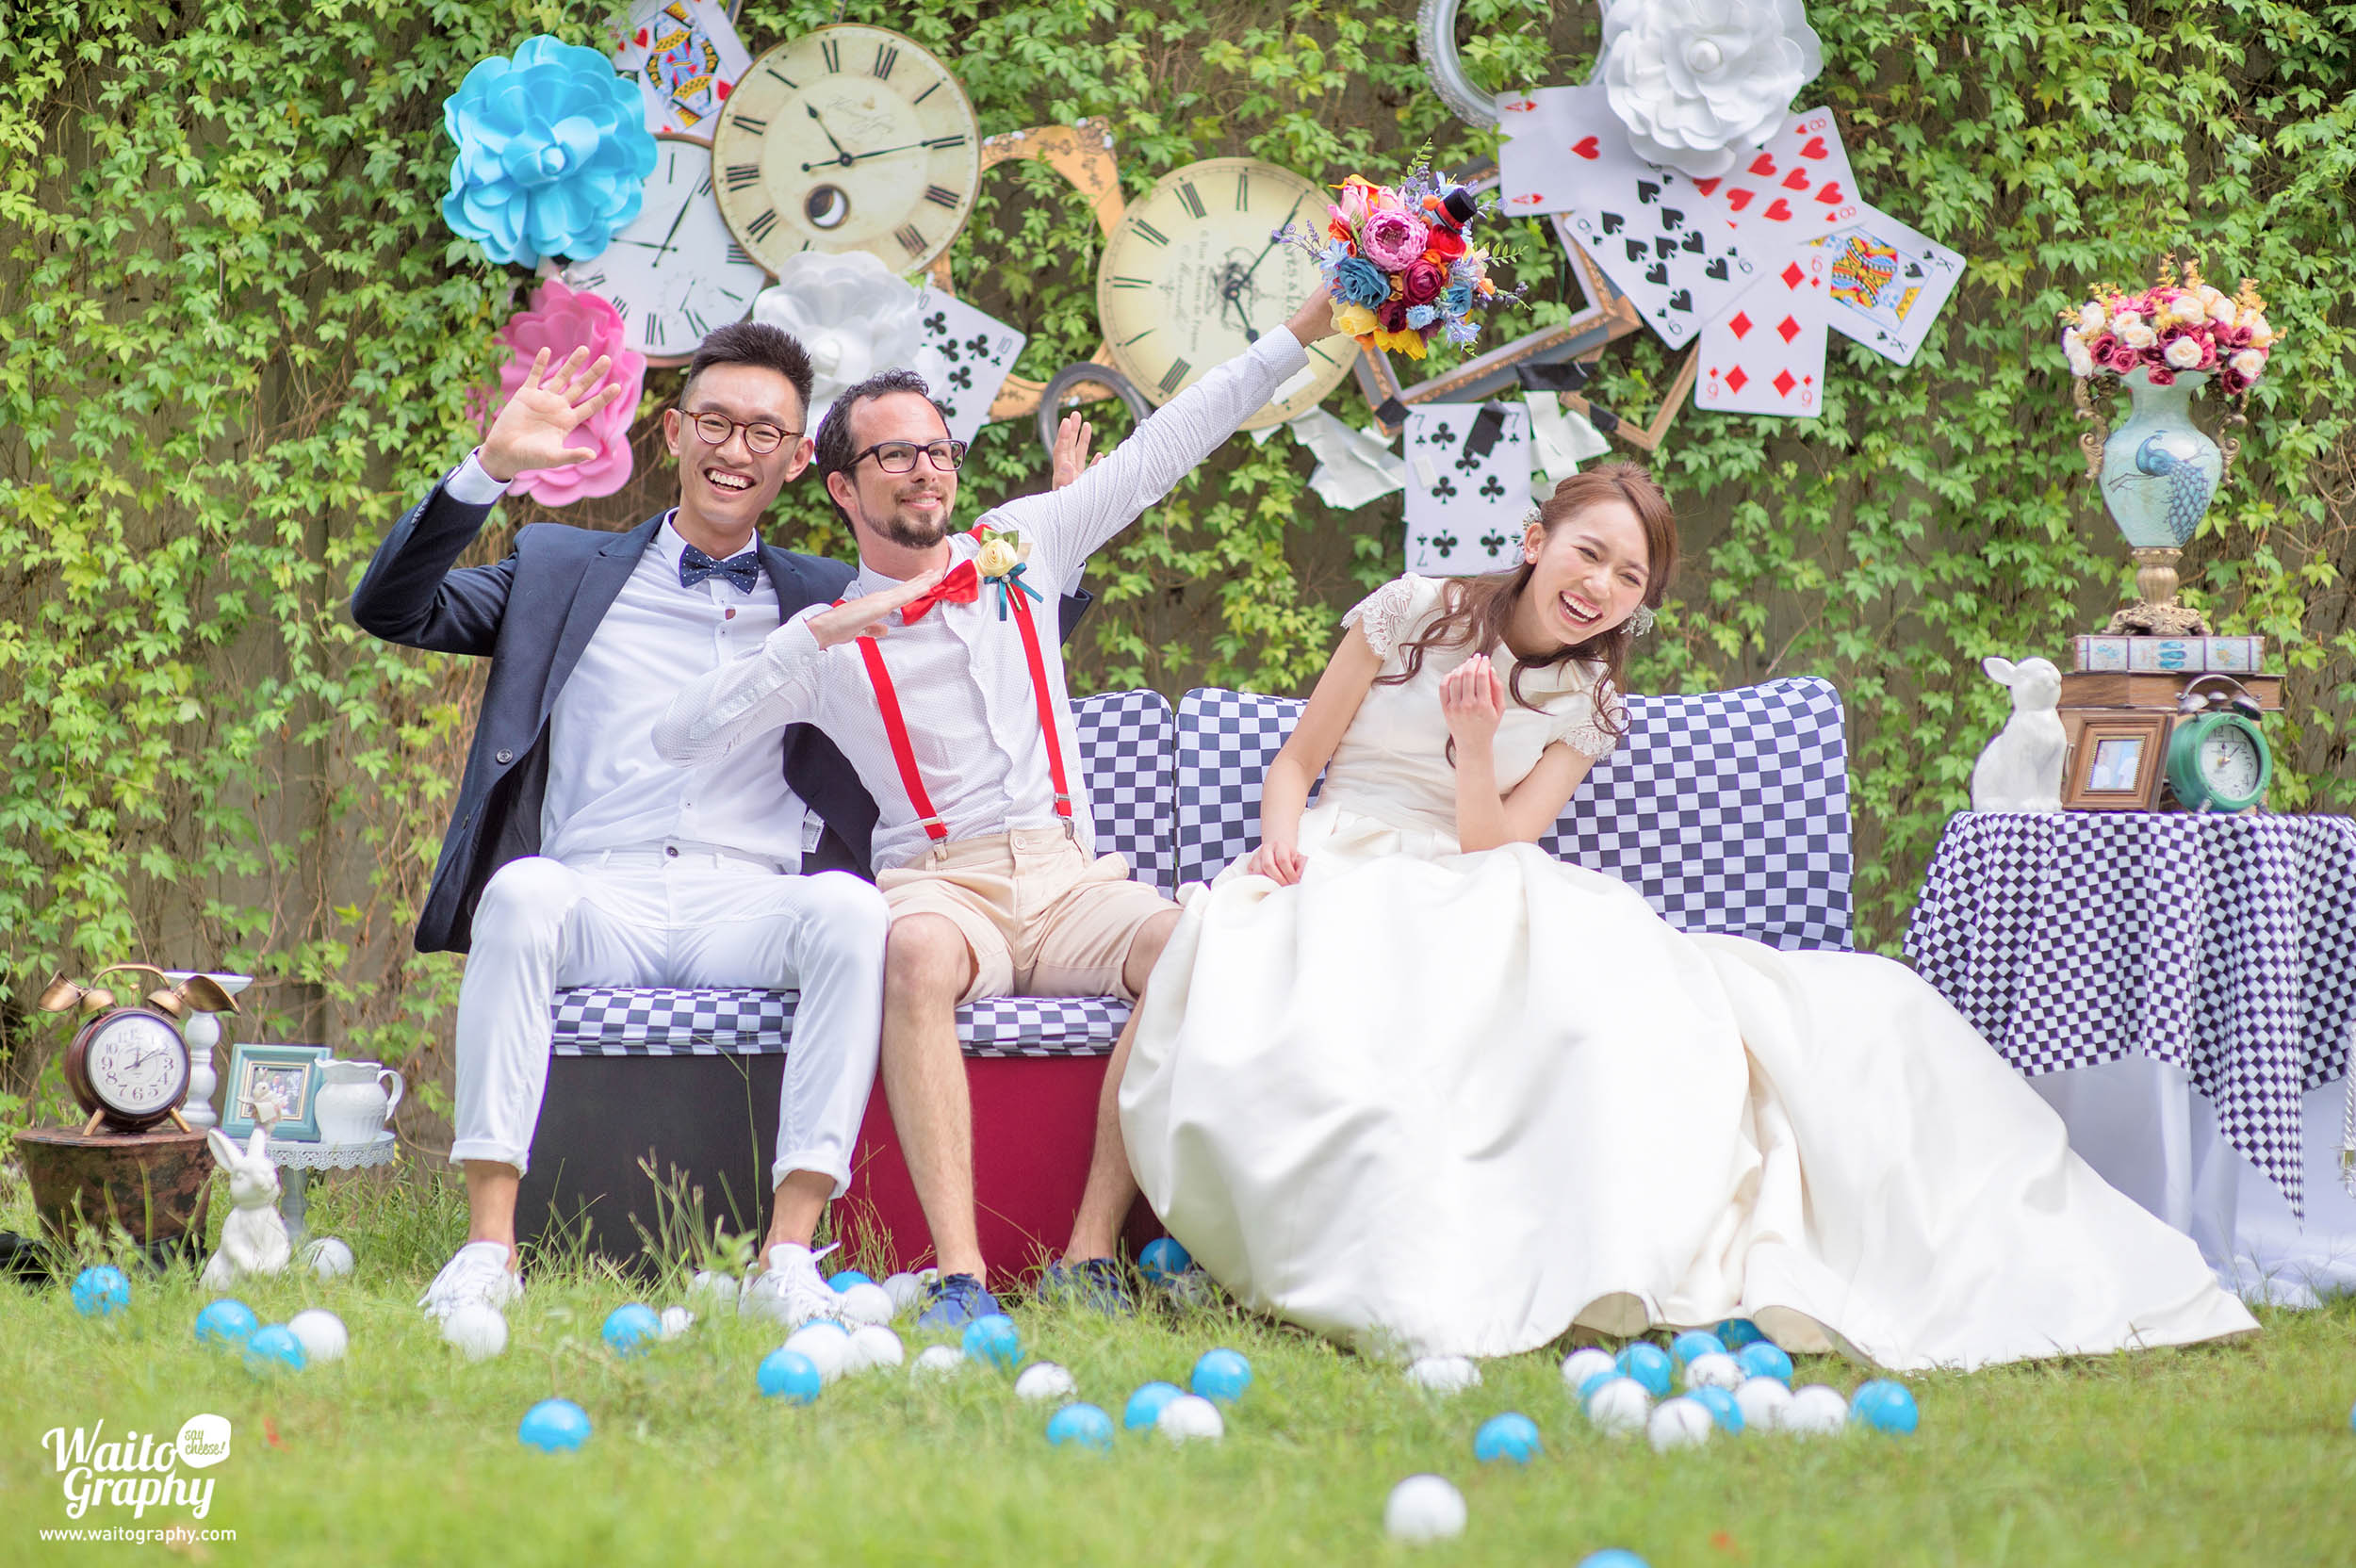 Beautiful lawn wedding at Hong Kong Zero Carbon Building captured by Hong Kong wedding photographer